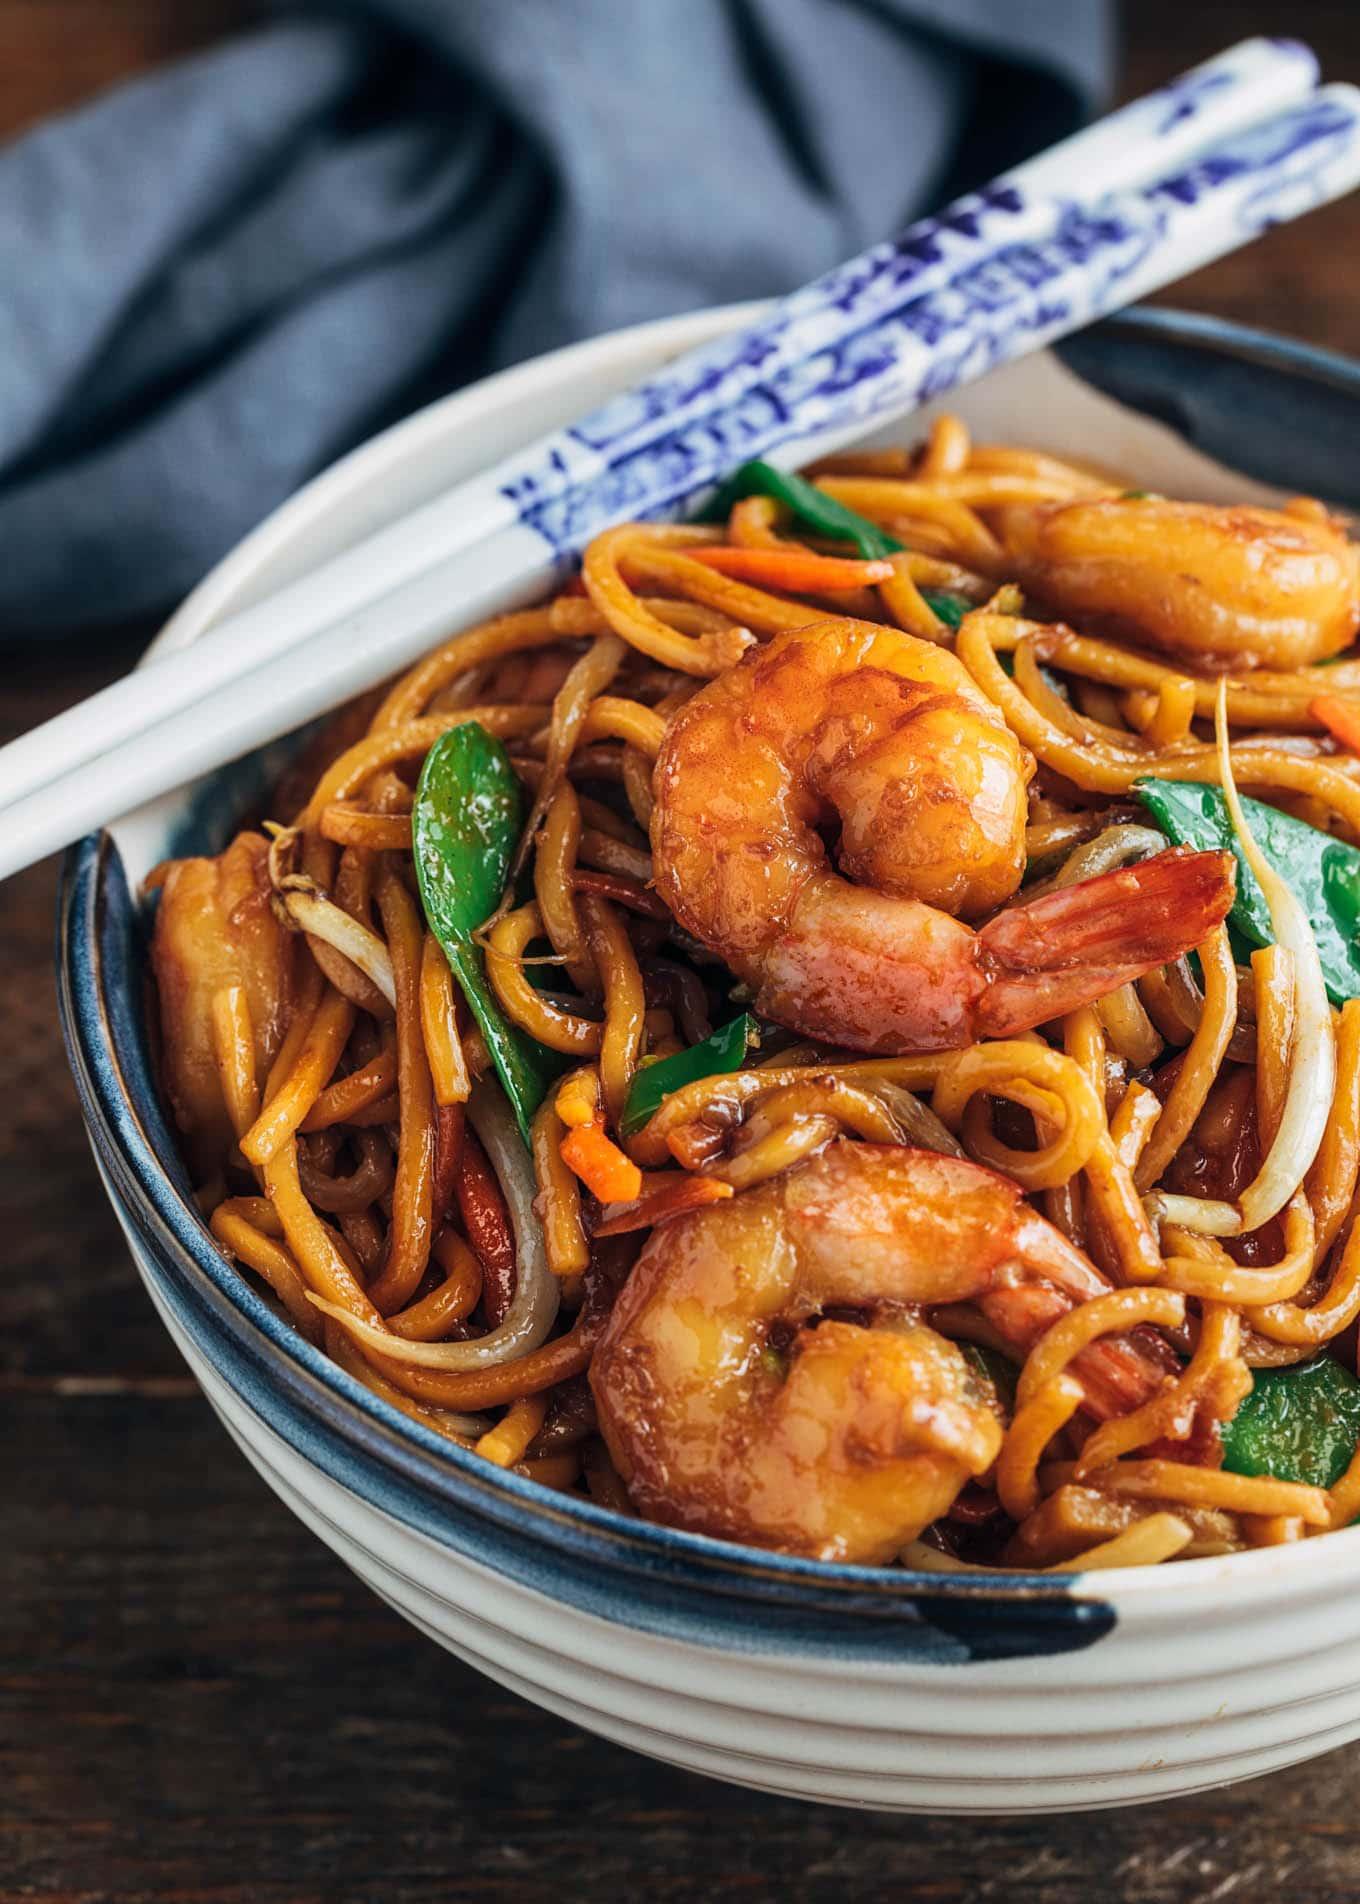 Shrimp Lo Mein Restaurant Style Striped Spatula